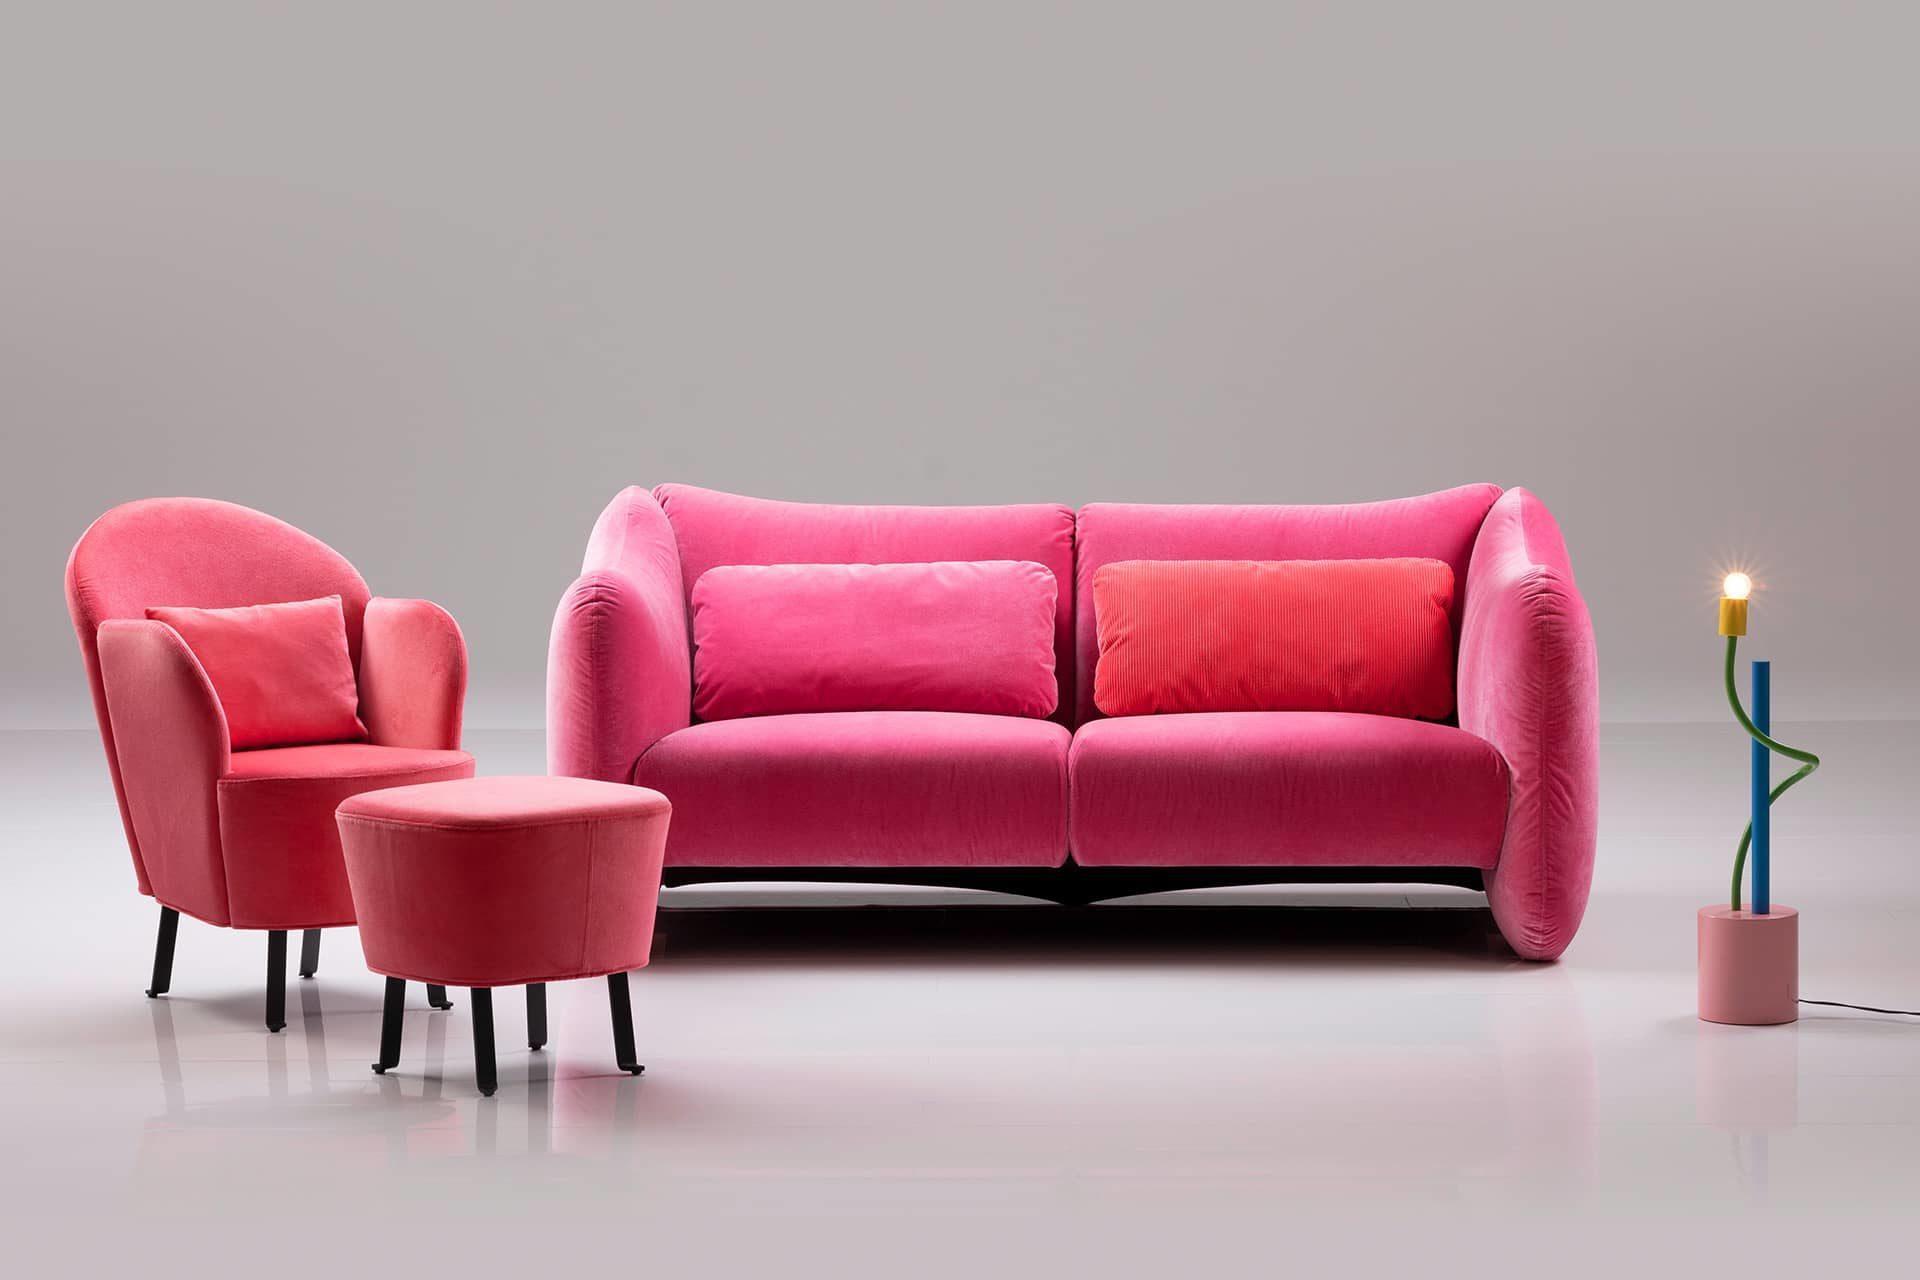 brühl Funktionssofas Eckgruppen Sessel Relax bongo bay floret Design